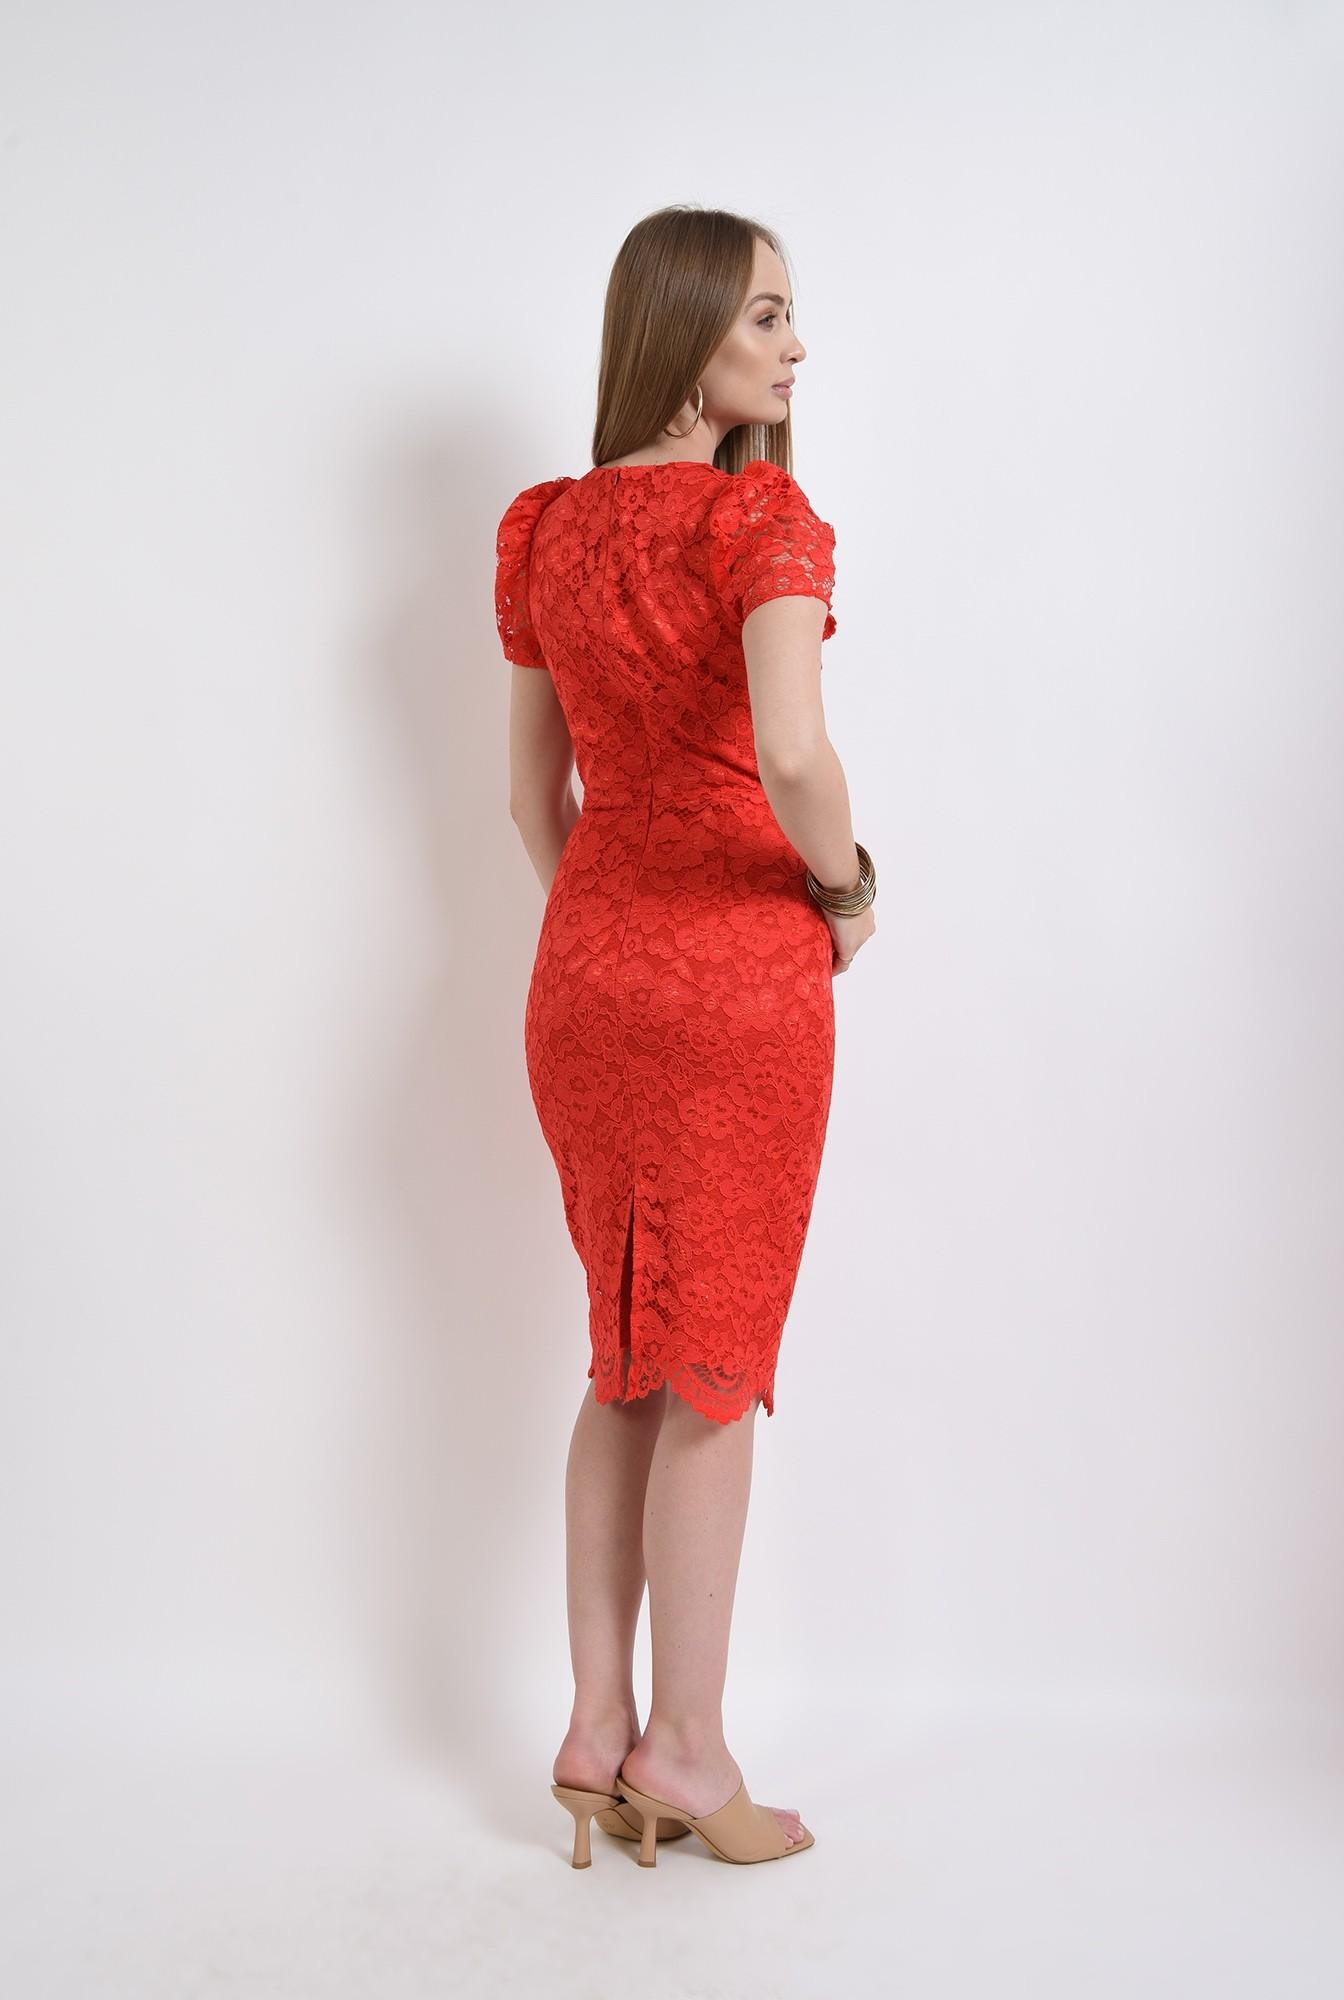 2 - rochie rosie, din dantela, conica